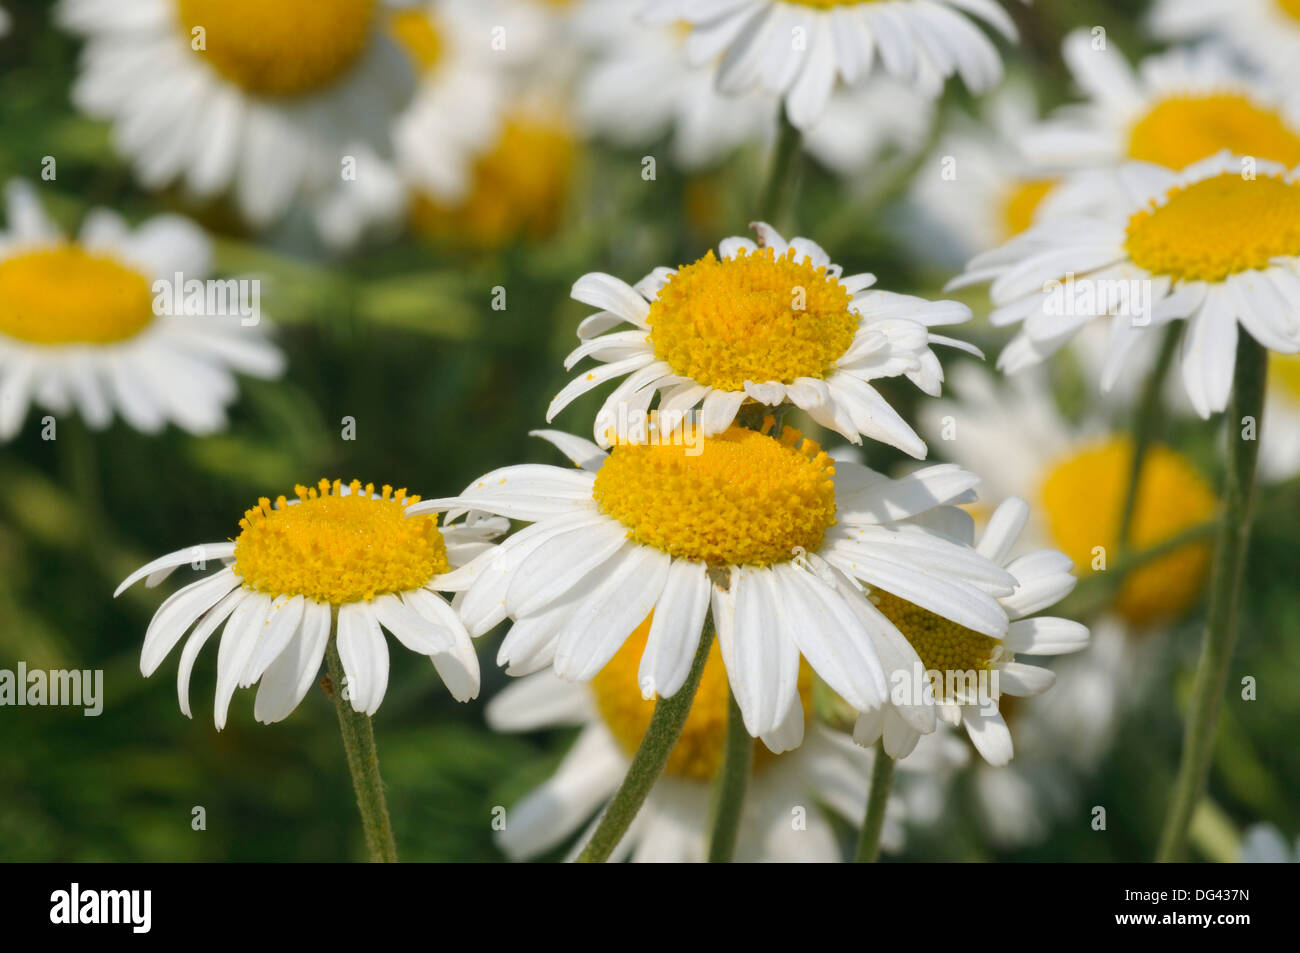 White Daisy Like Flower Stock Photos White Daisy Like Flower Stock